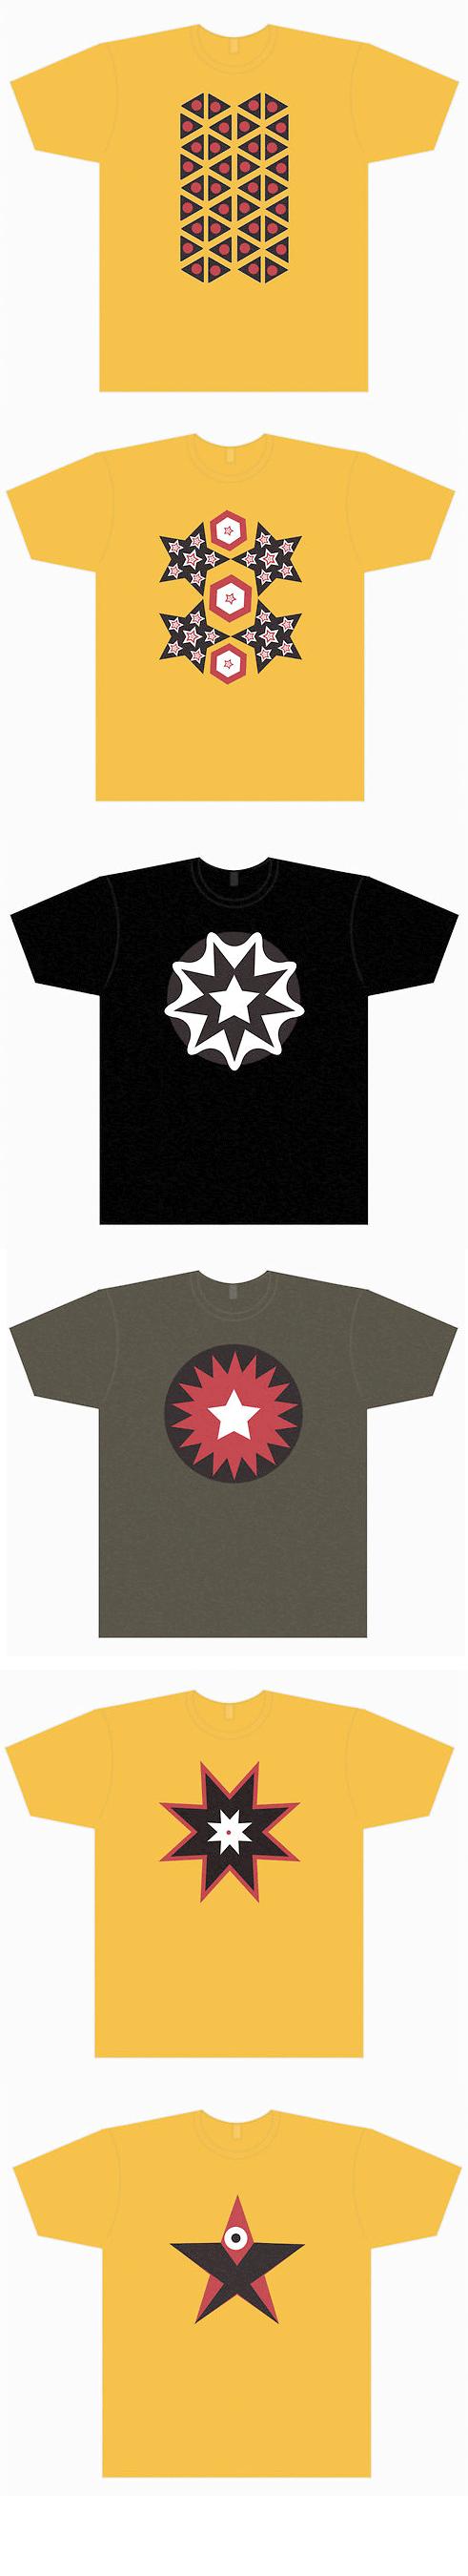 Star Tattoo Flash Inspired tshirts by Yoso Tattoo